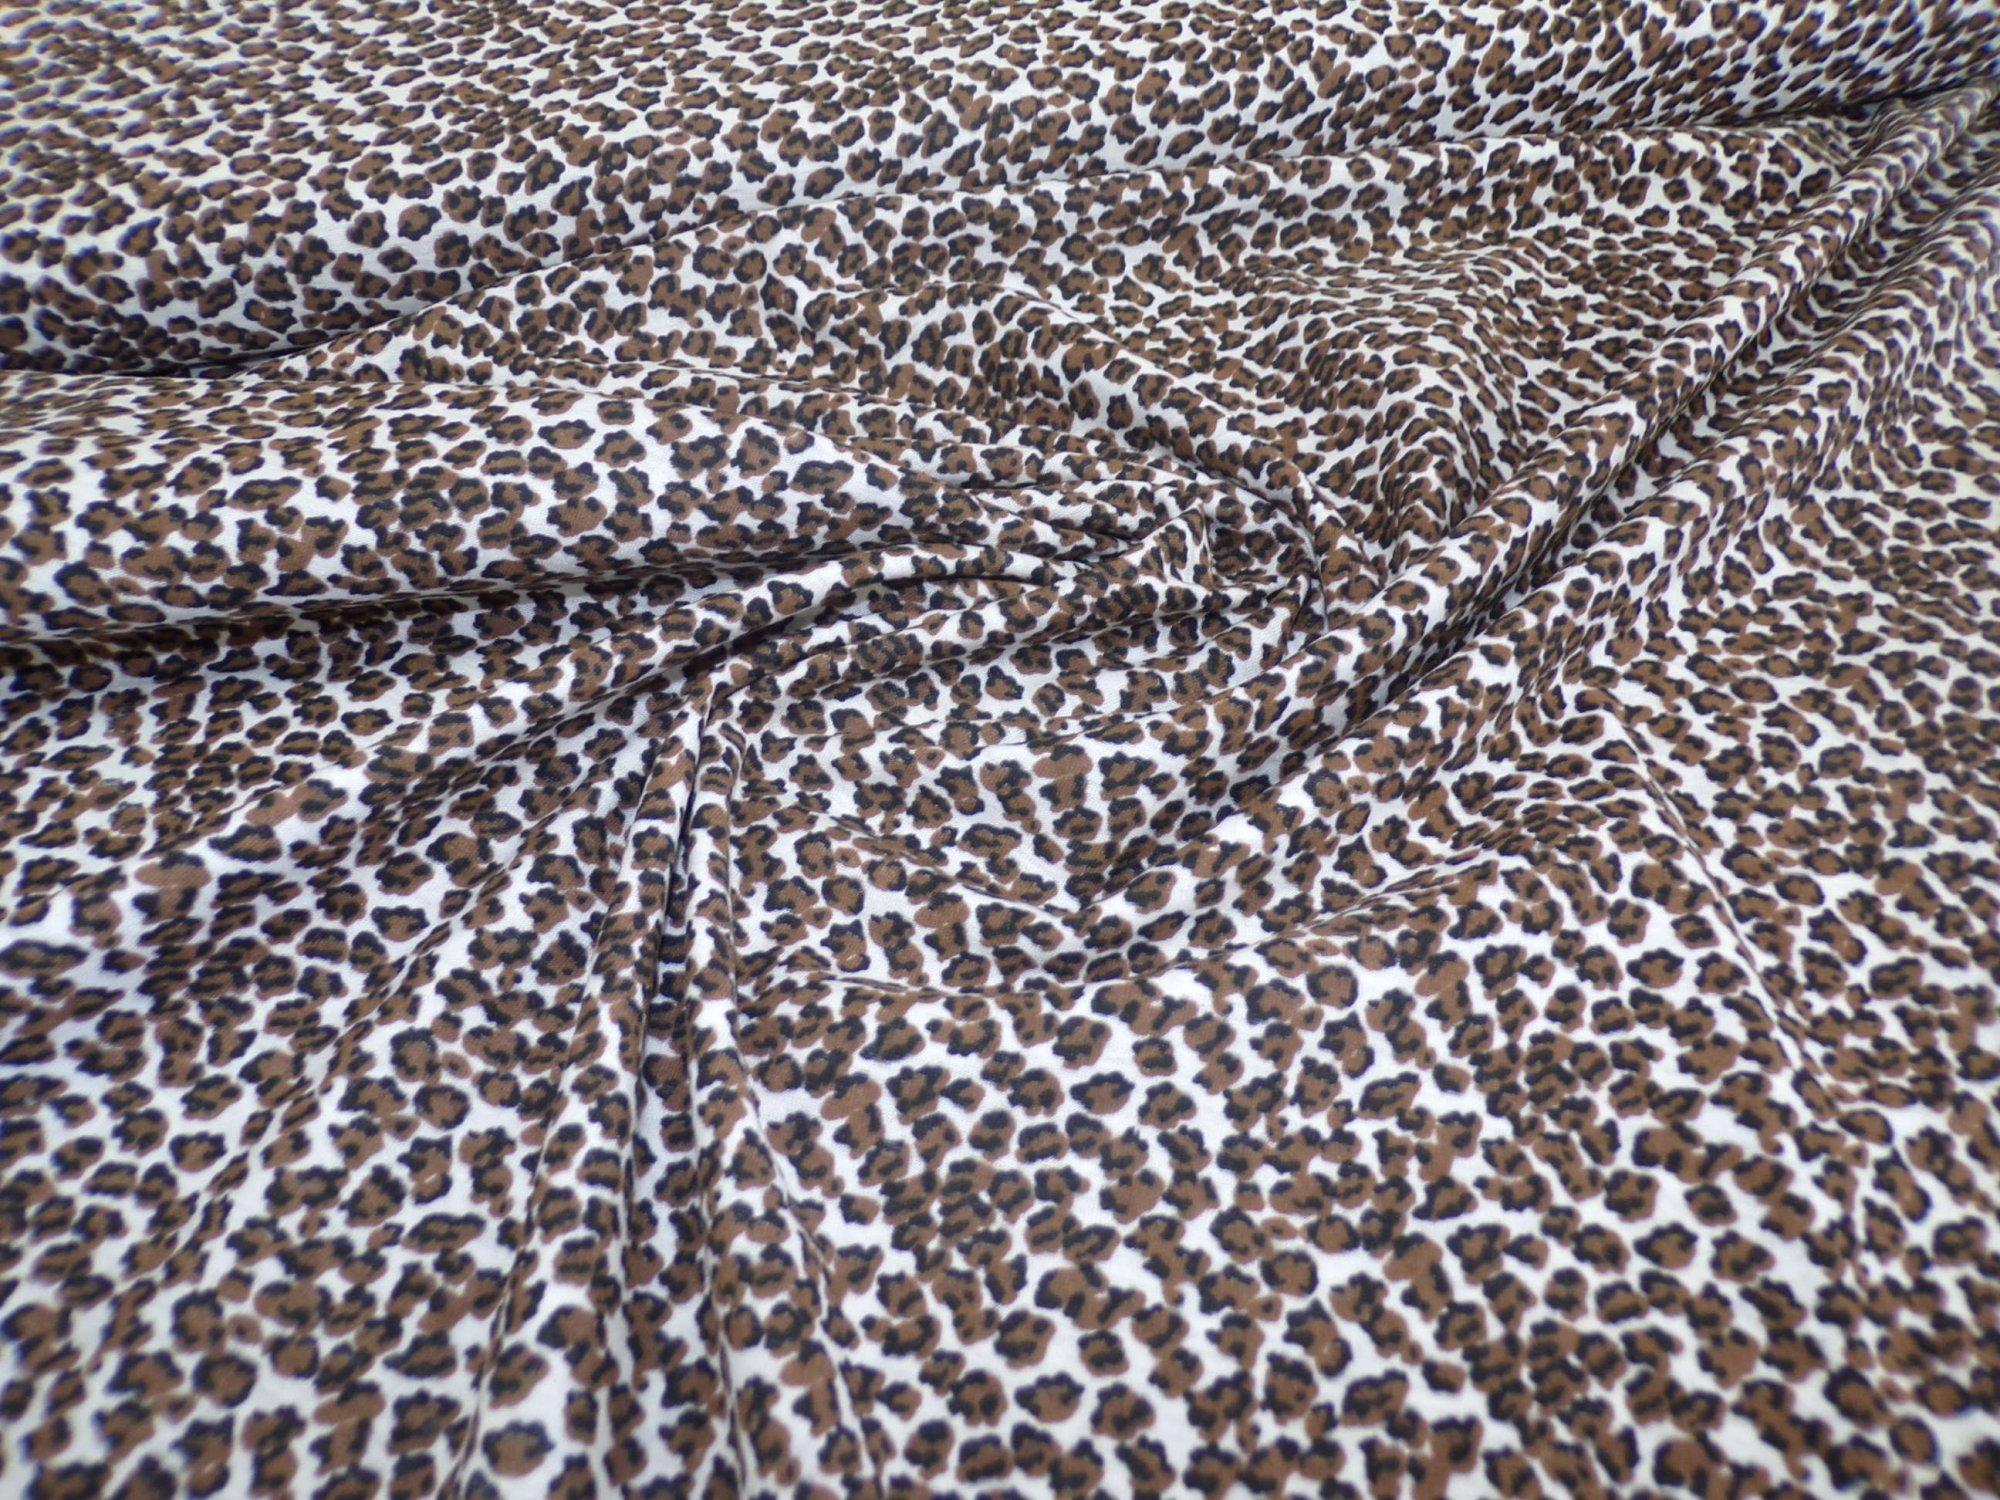 Jersey - Brown / Black Leopard Print